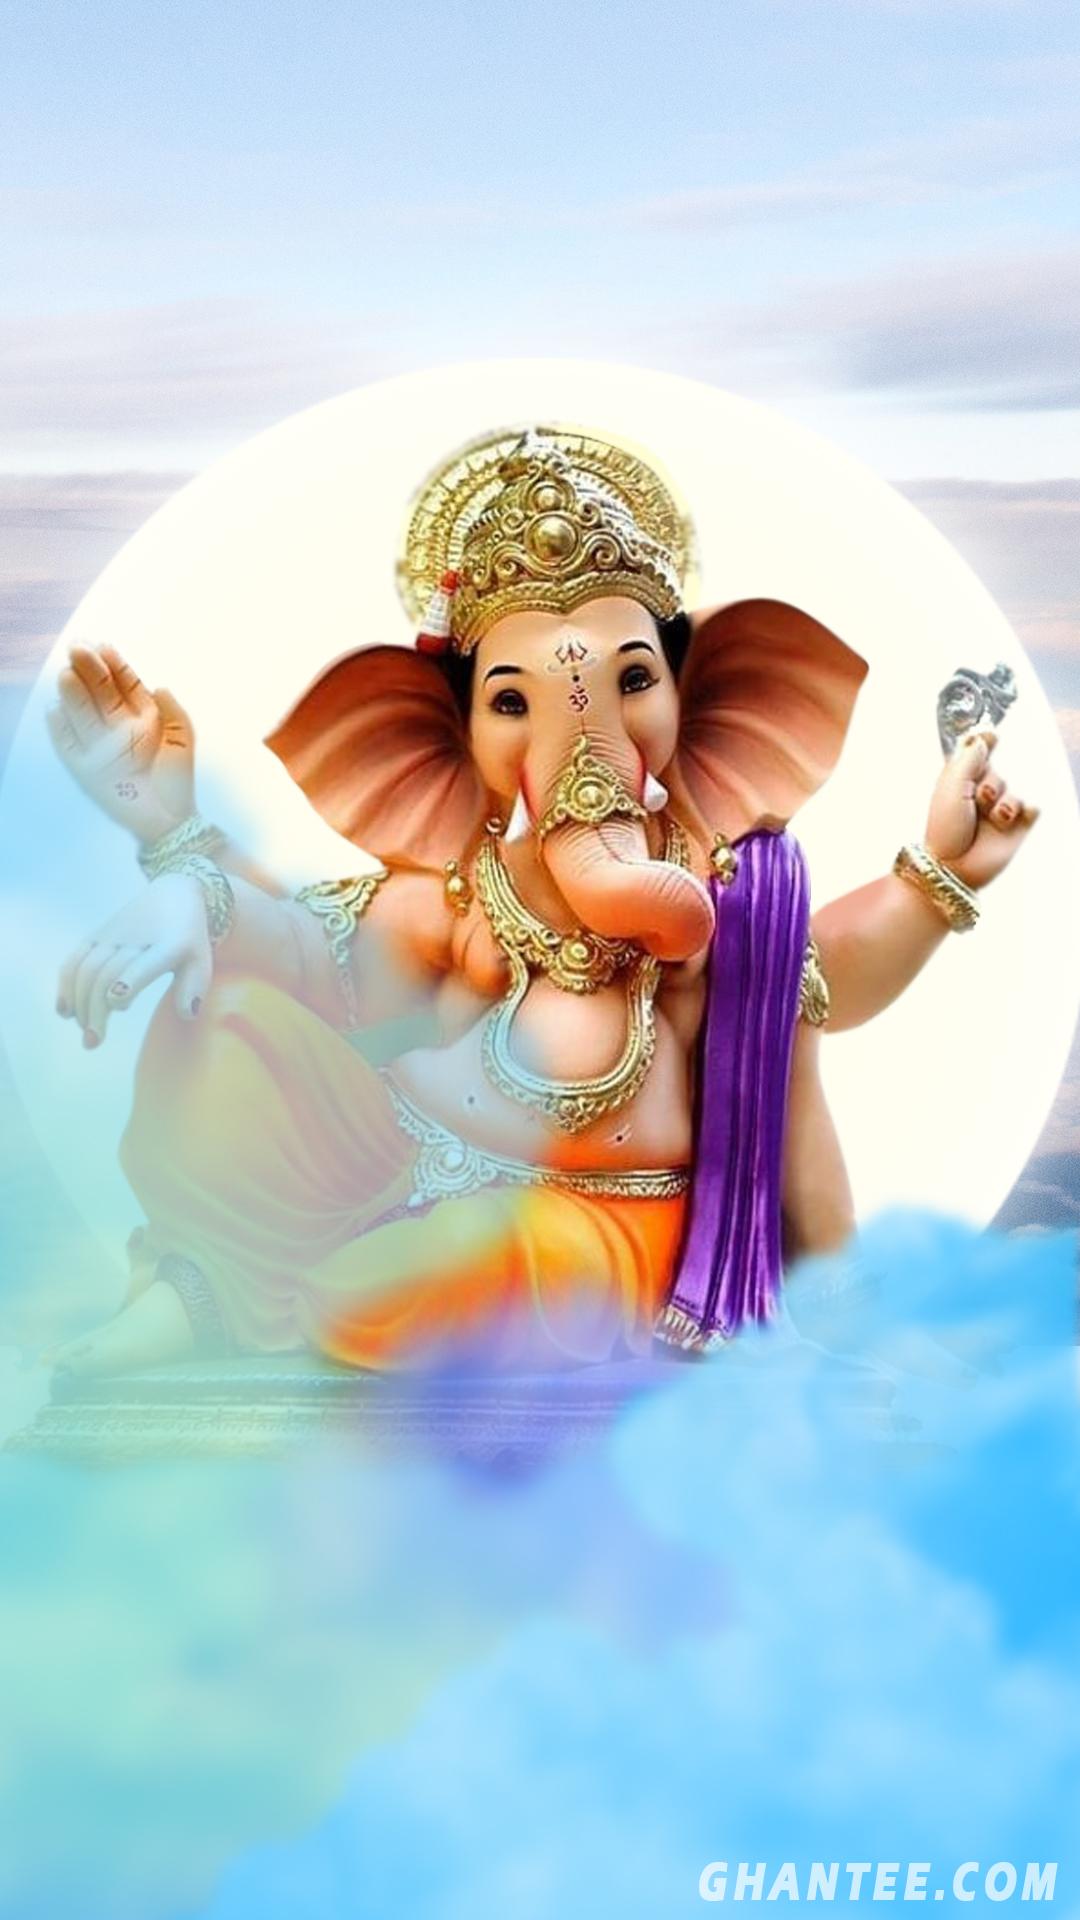 ganesh chaturthi image wallpaper for mobile